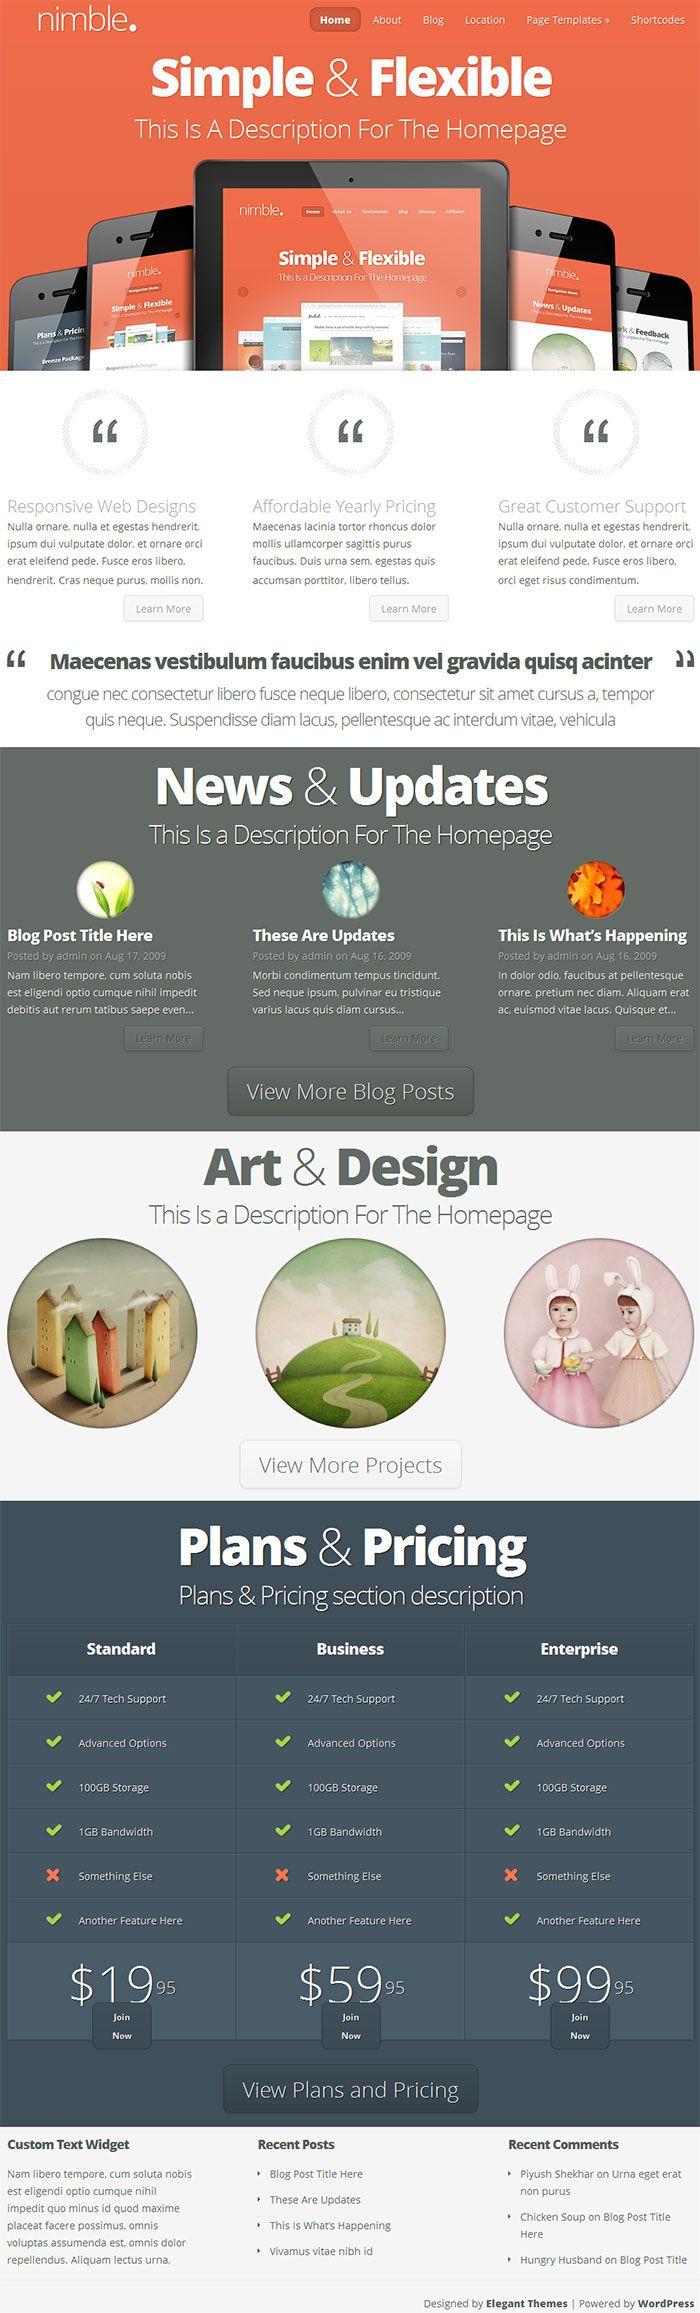 Designed by elegant themes powered by wordpress - Nimble Wordpress Theme A Minimalistic Stunning Portfolio Theme By Elegantthemes